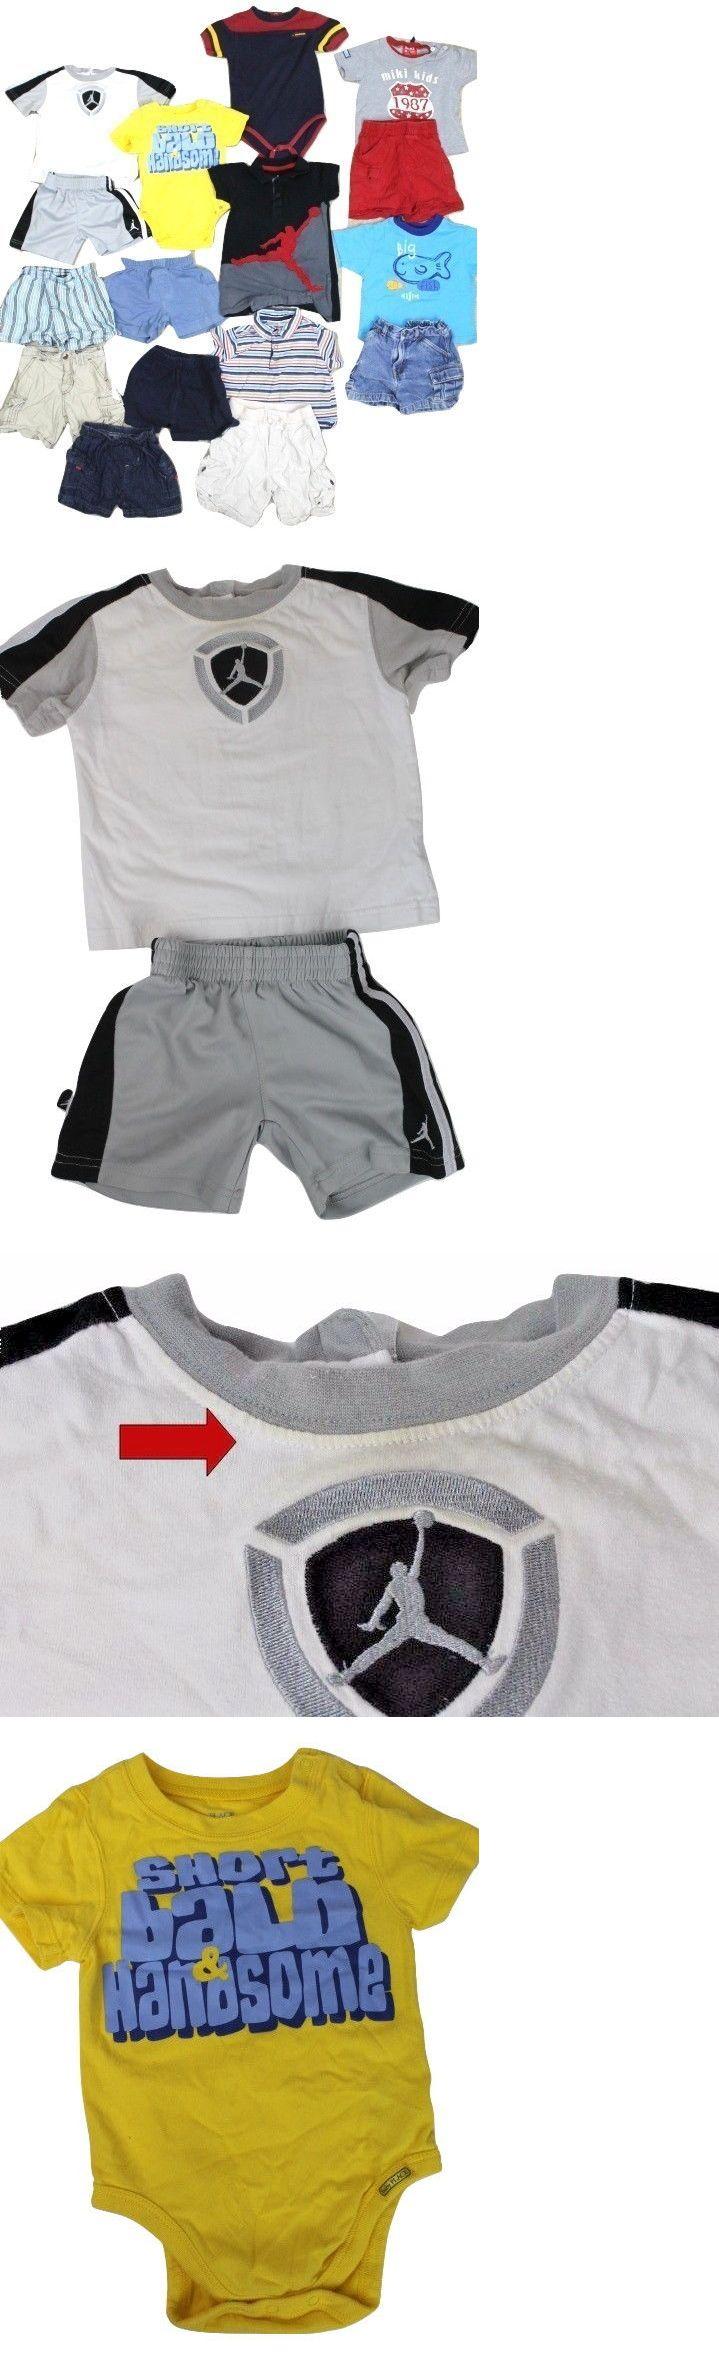 Michael Jordan Baby Clothing: Boys Baby 16 Pc Lot Michael Jordan Childrens Place Gap Summer 12-18 Months -> BUY IT NOW ONLY: $44 on eBay!